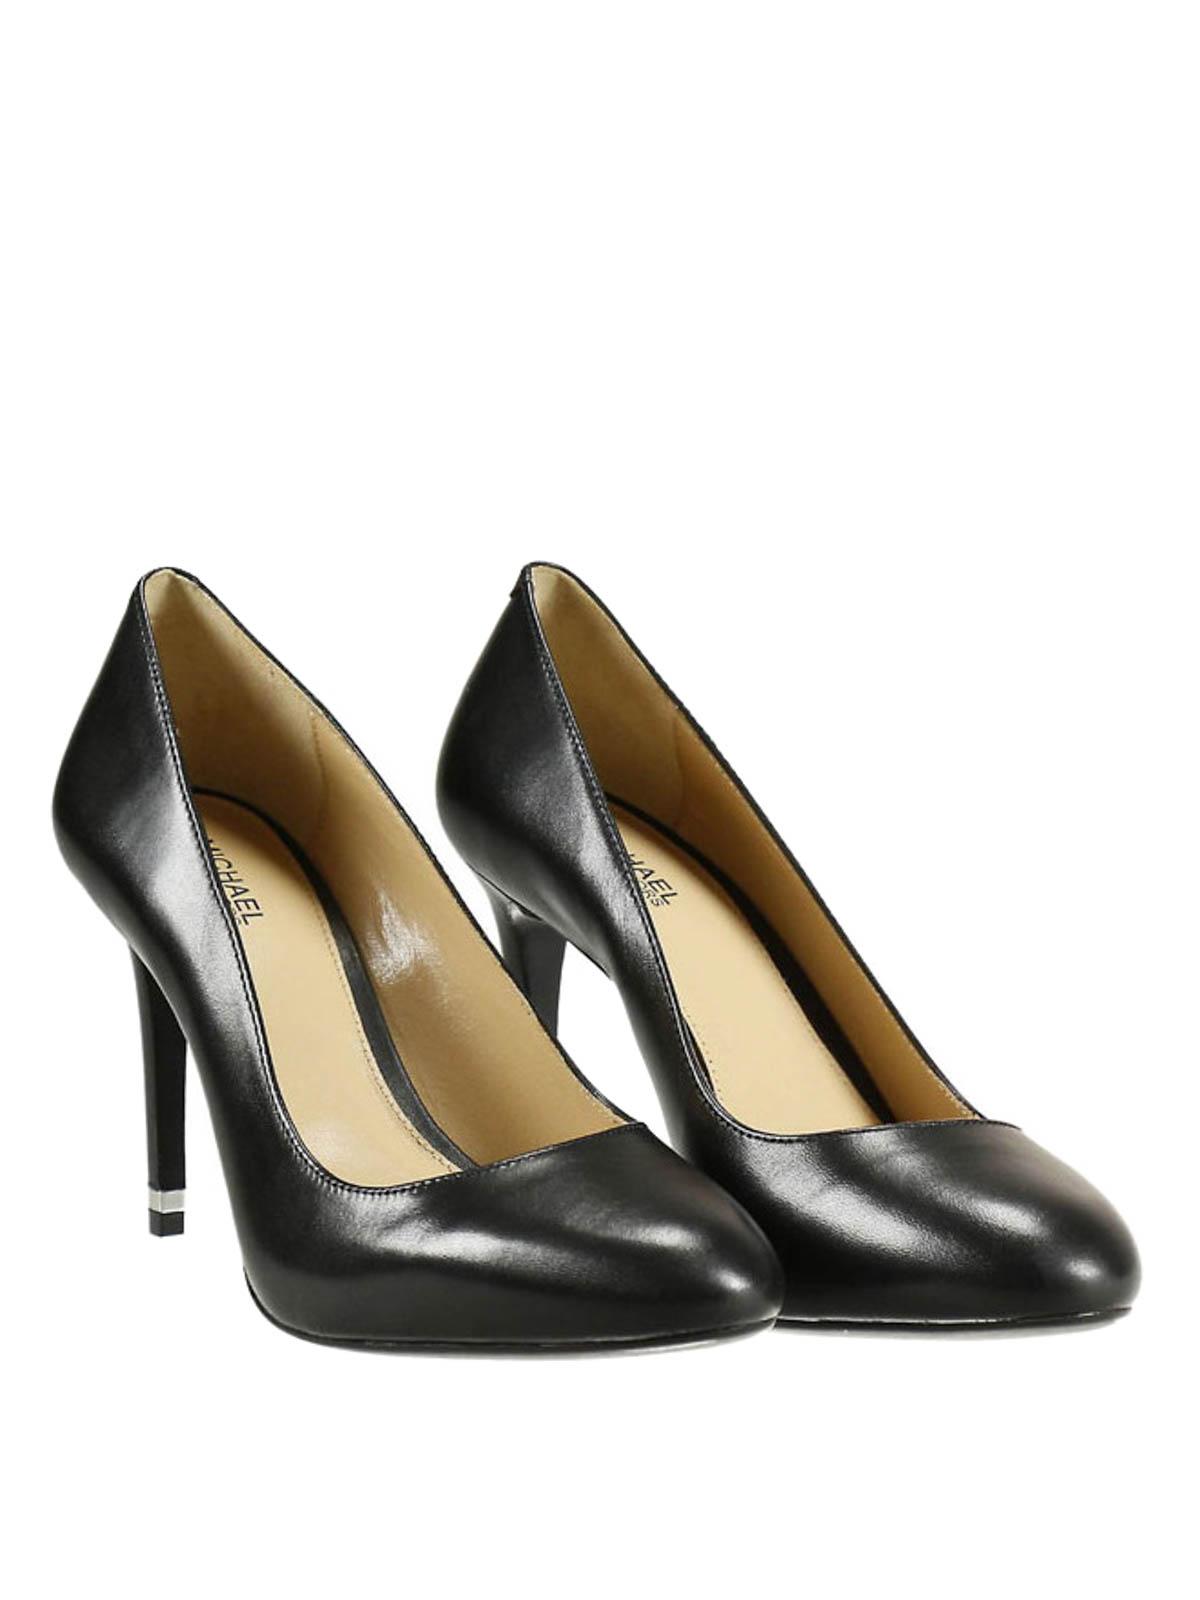 Michael Kors                                                            Ashby leather pumps